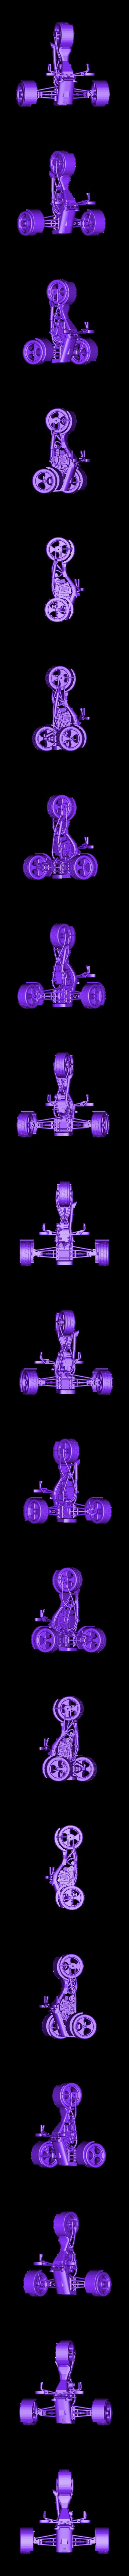 totaal.stl Download free STL file trick (custom) • 3D printer model, jasperbaudoin